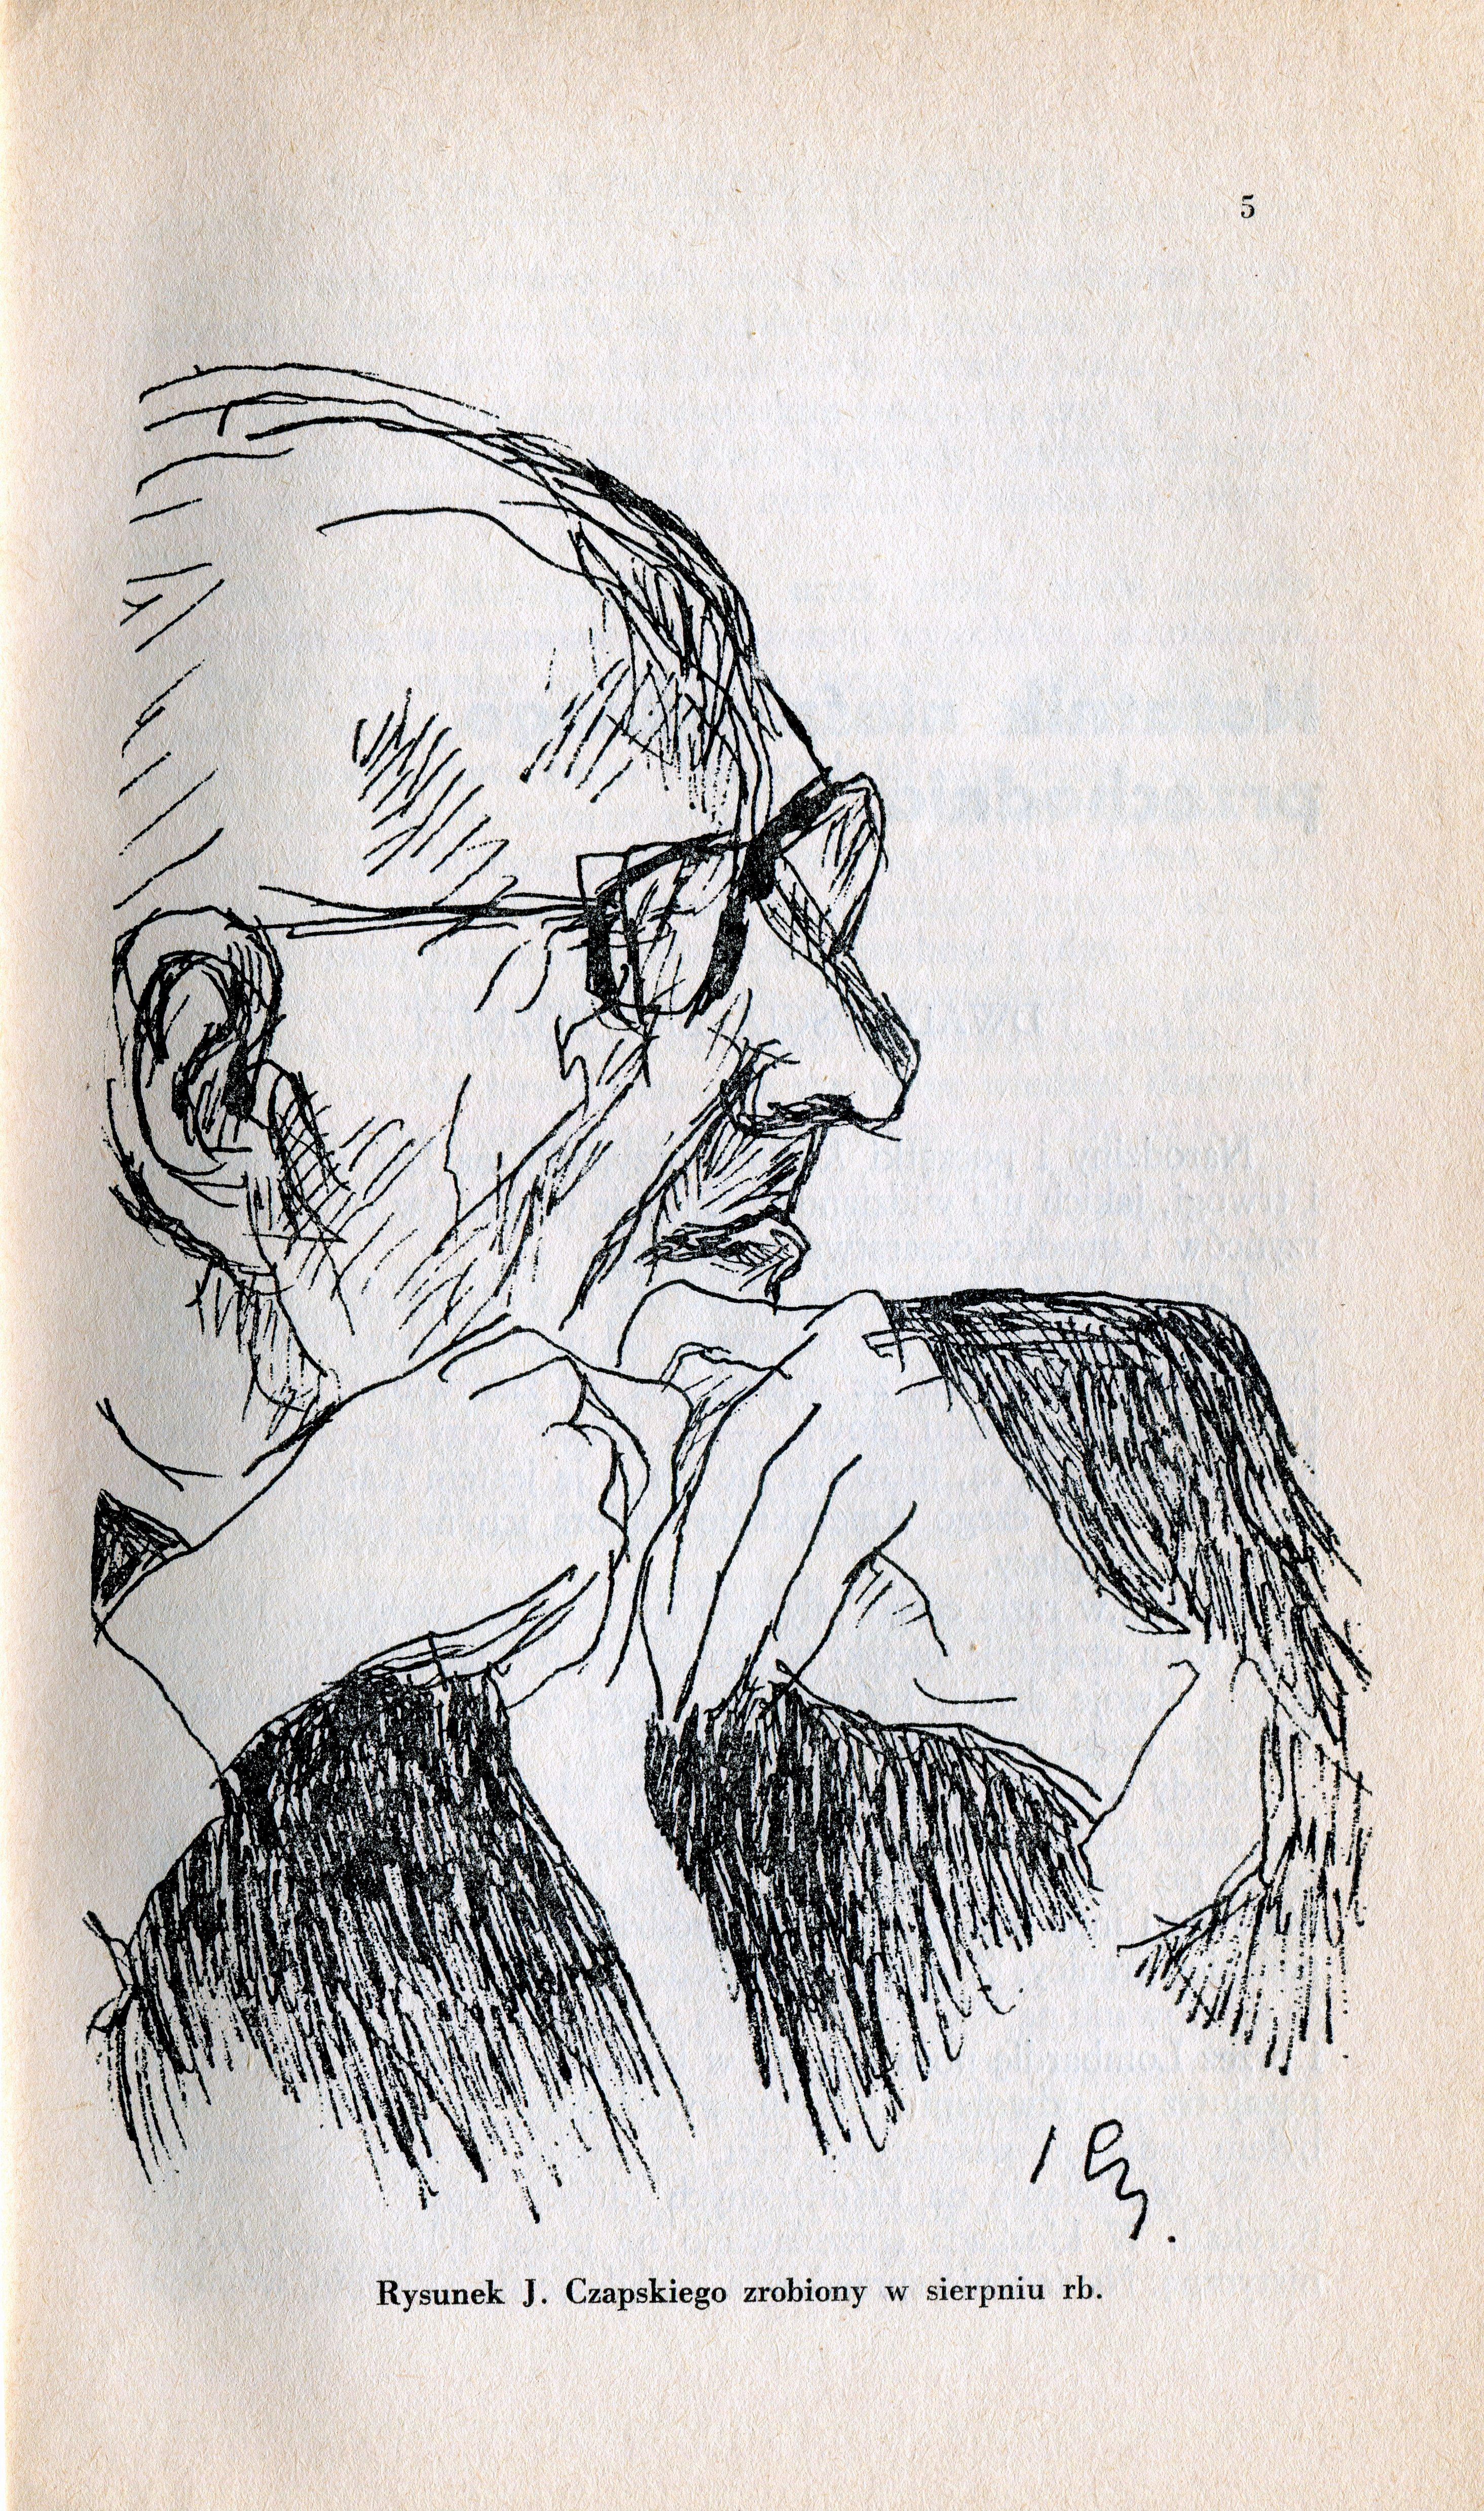 "<div class='inner-box'><div class='close-desc'></div><span class='opis'>Portret Jerzego Stempowskiego. Józef Czapski, rysunek - ""Kultura"" nr 11/266, 1969 r. s. 5.</span><div class='clearfix'></div><span>Sygn. sm00251</span><div class='clearfix'></div><span>© Instytut Literacki</span></div>"